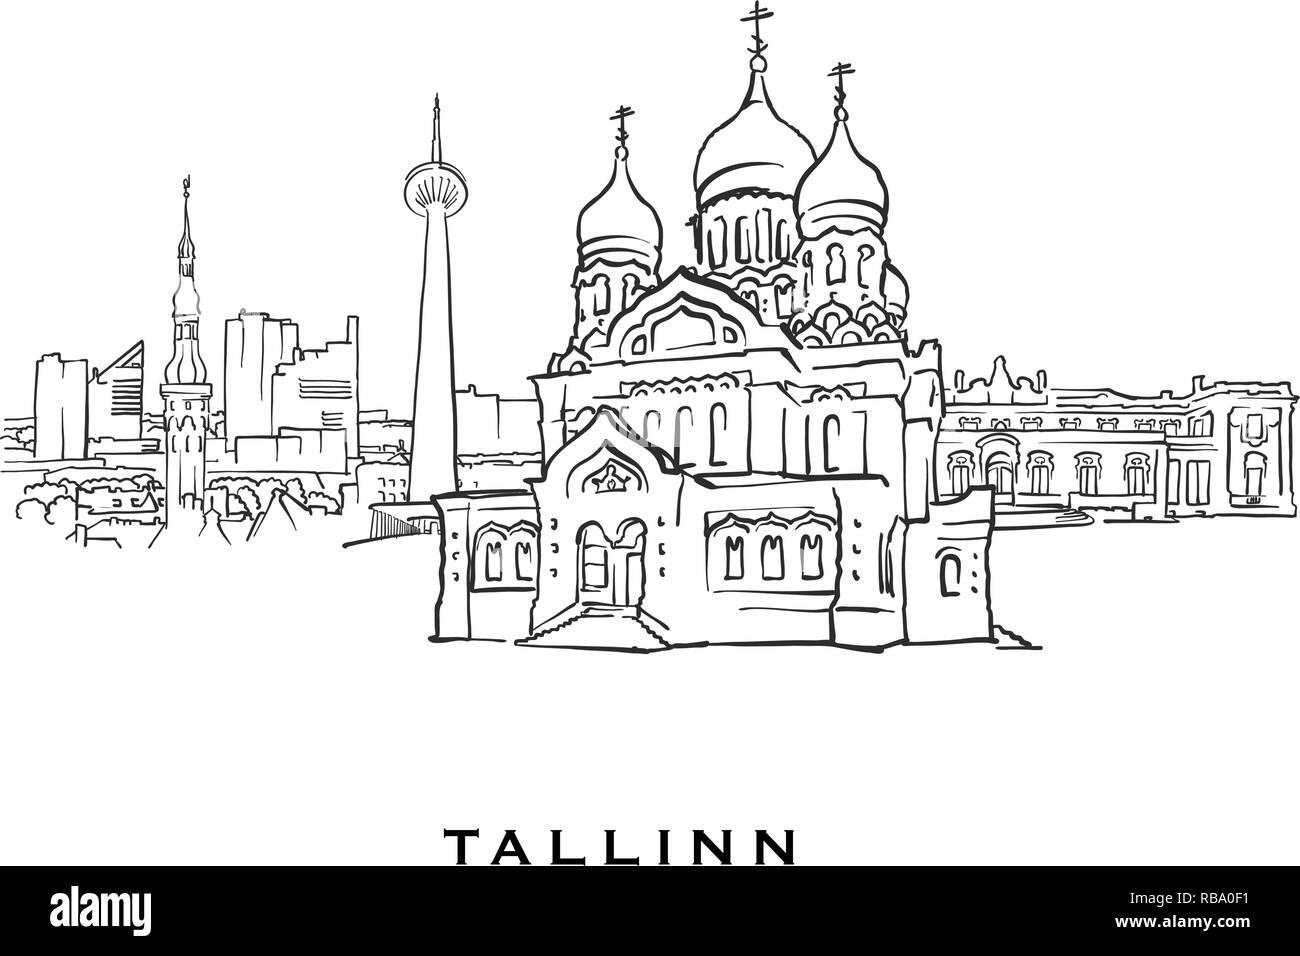 Tallinn Estonia famous architecture  Outlined vector sketch